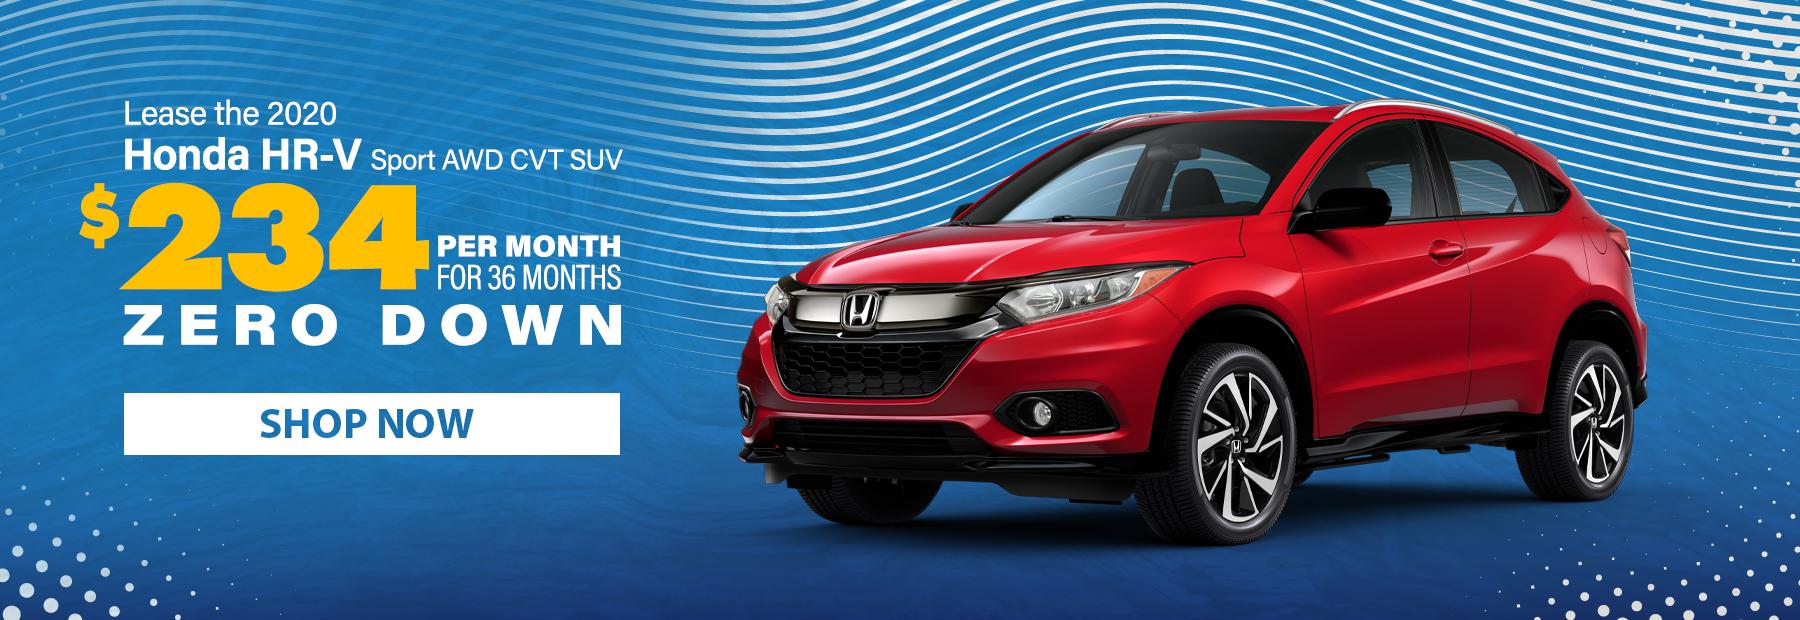 Lease a 2020 Honda HR-V Sport AWD CVT SUV